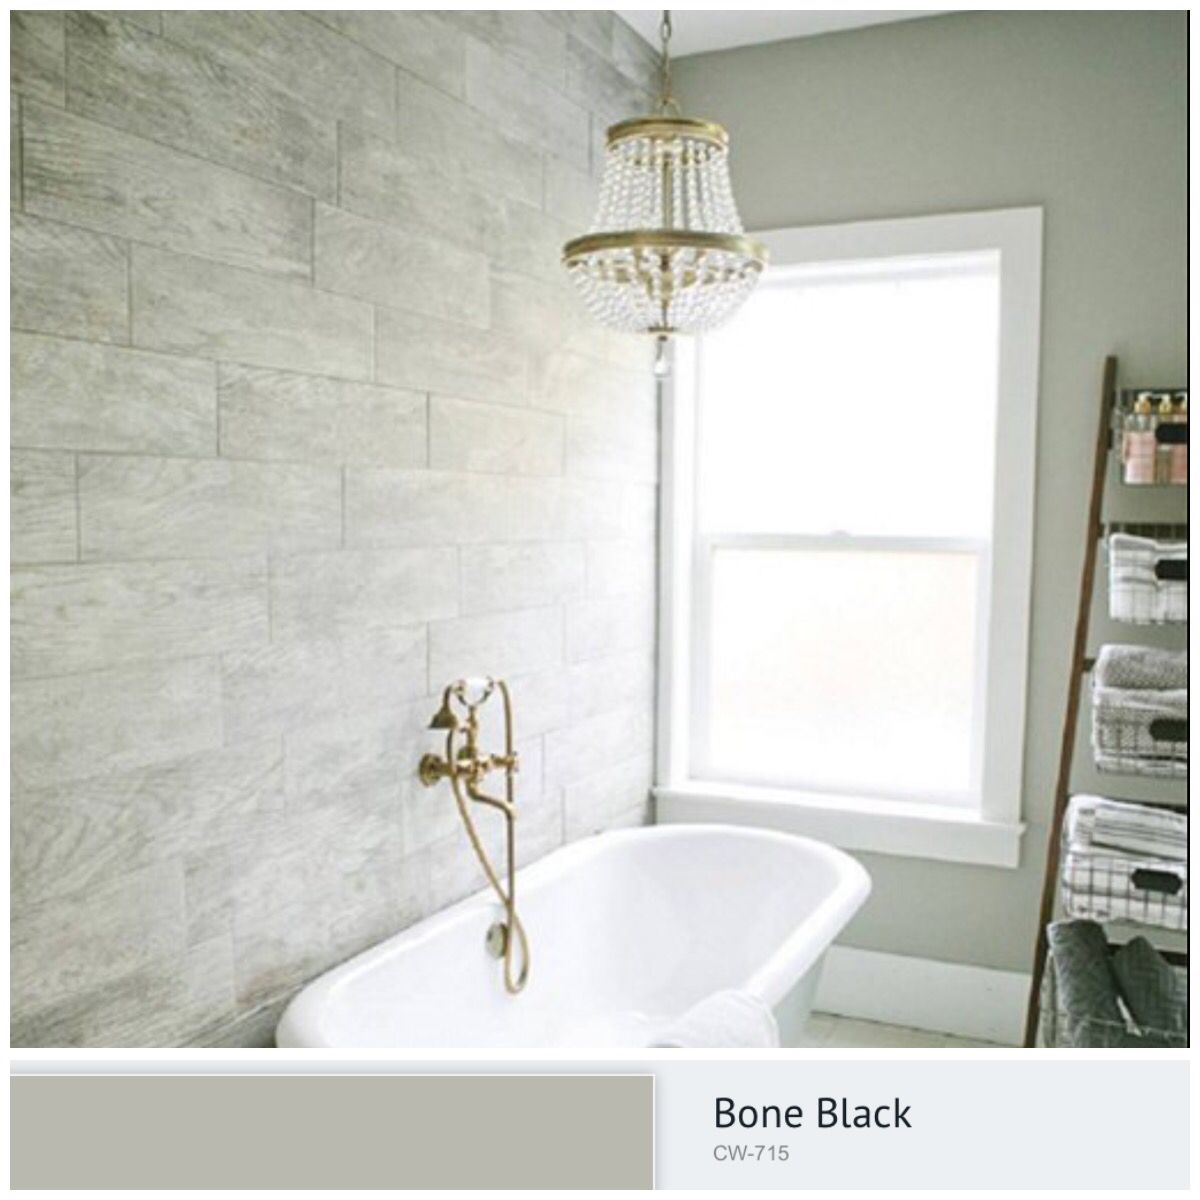 Benjamin Moore Cw 715 Bone Black Paint Color Ideas Tbm